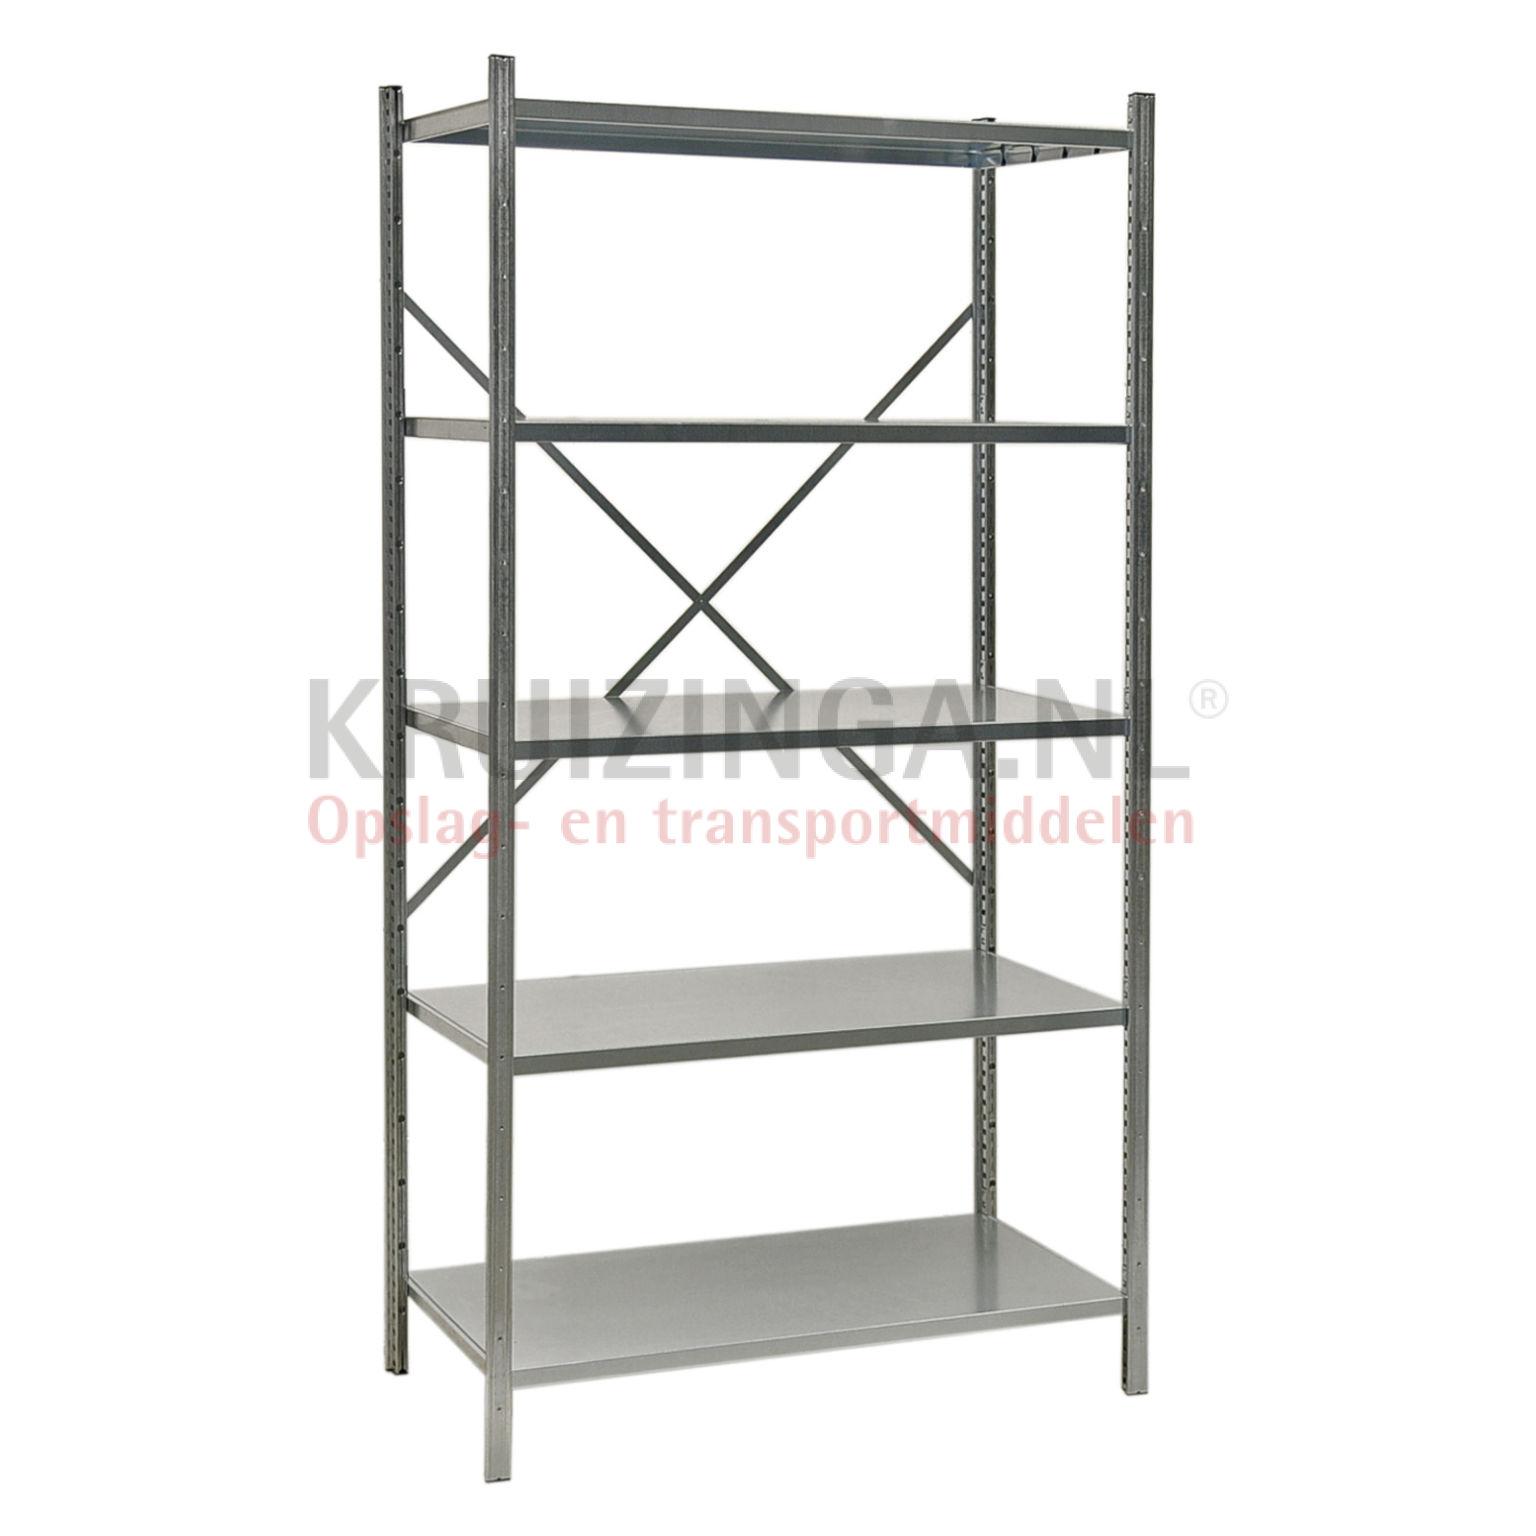 etagere rayonnage heavy duty en acier rayonnage garage du kg par tagre niveaux mm h x mm l x mm. Black Bedroom Furniture Sets. Home Design Ideas